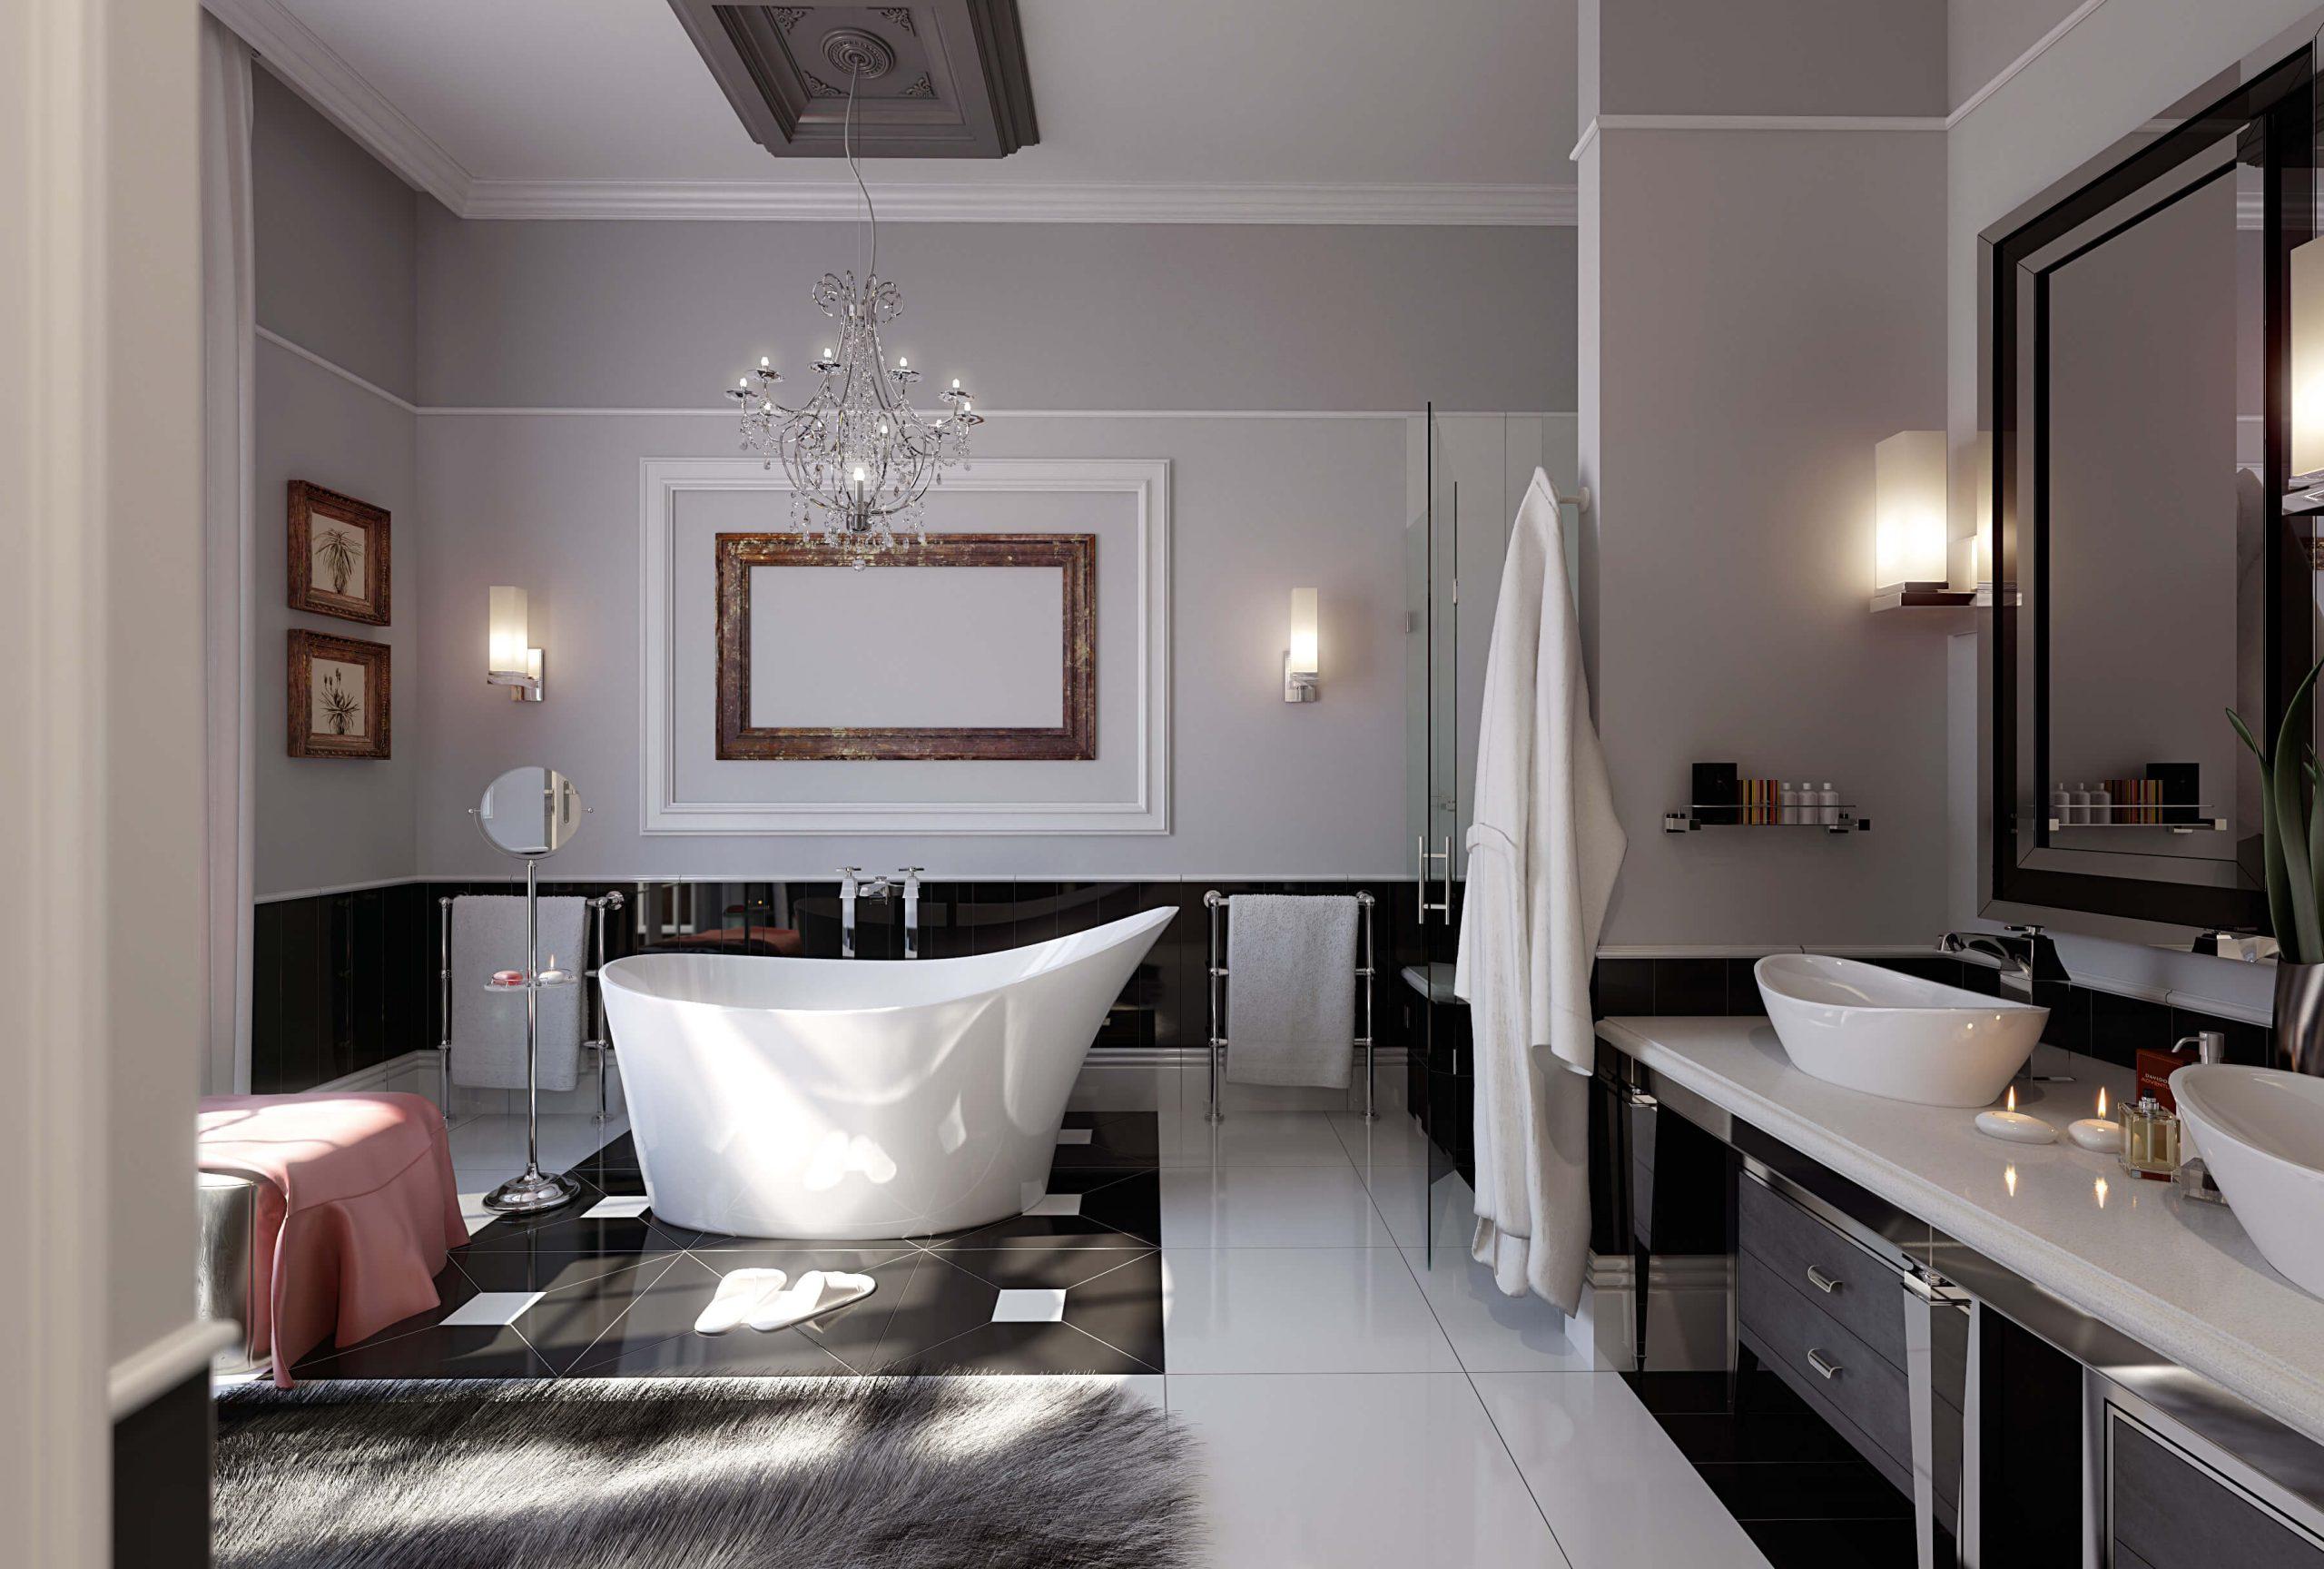 Bathroom Vanity Lights Vancouver 3 stylish ways to light your bathroom | professional vancouver